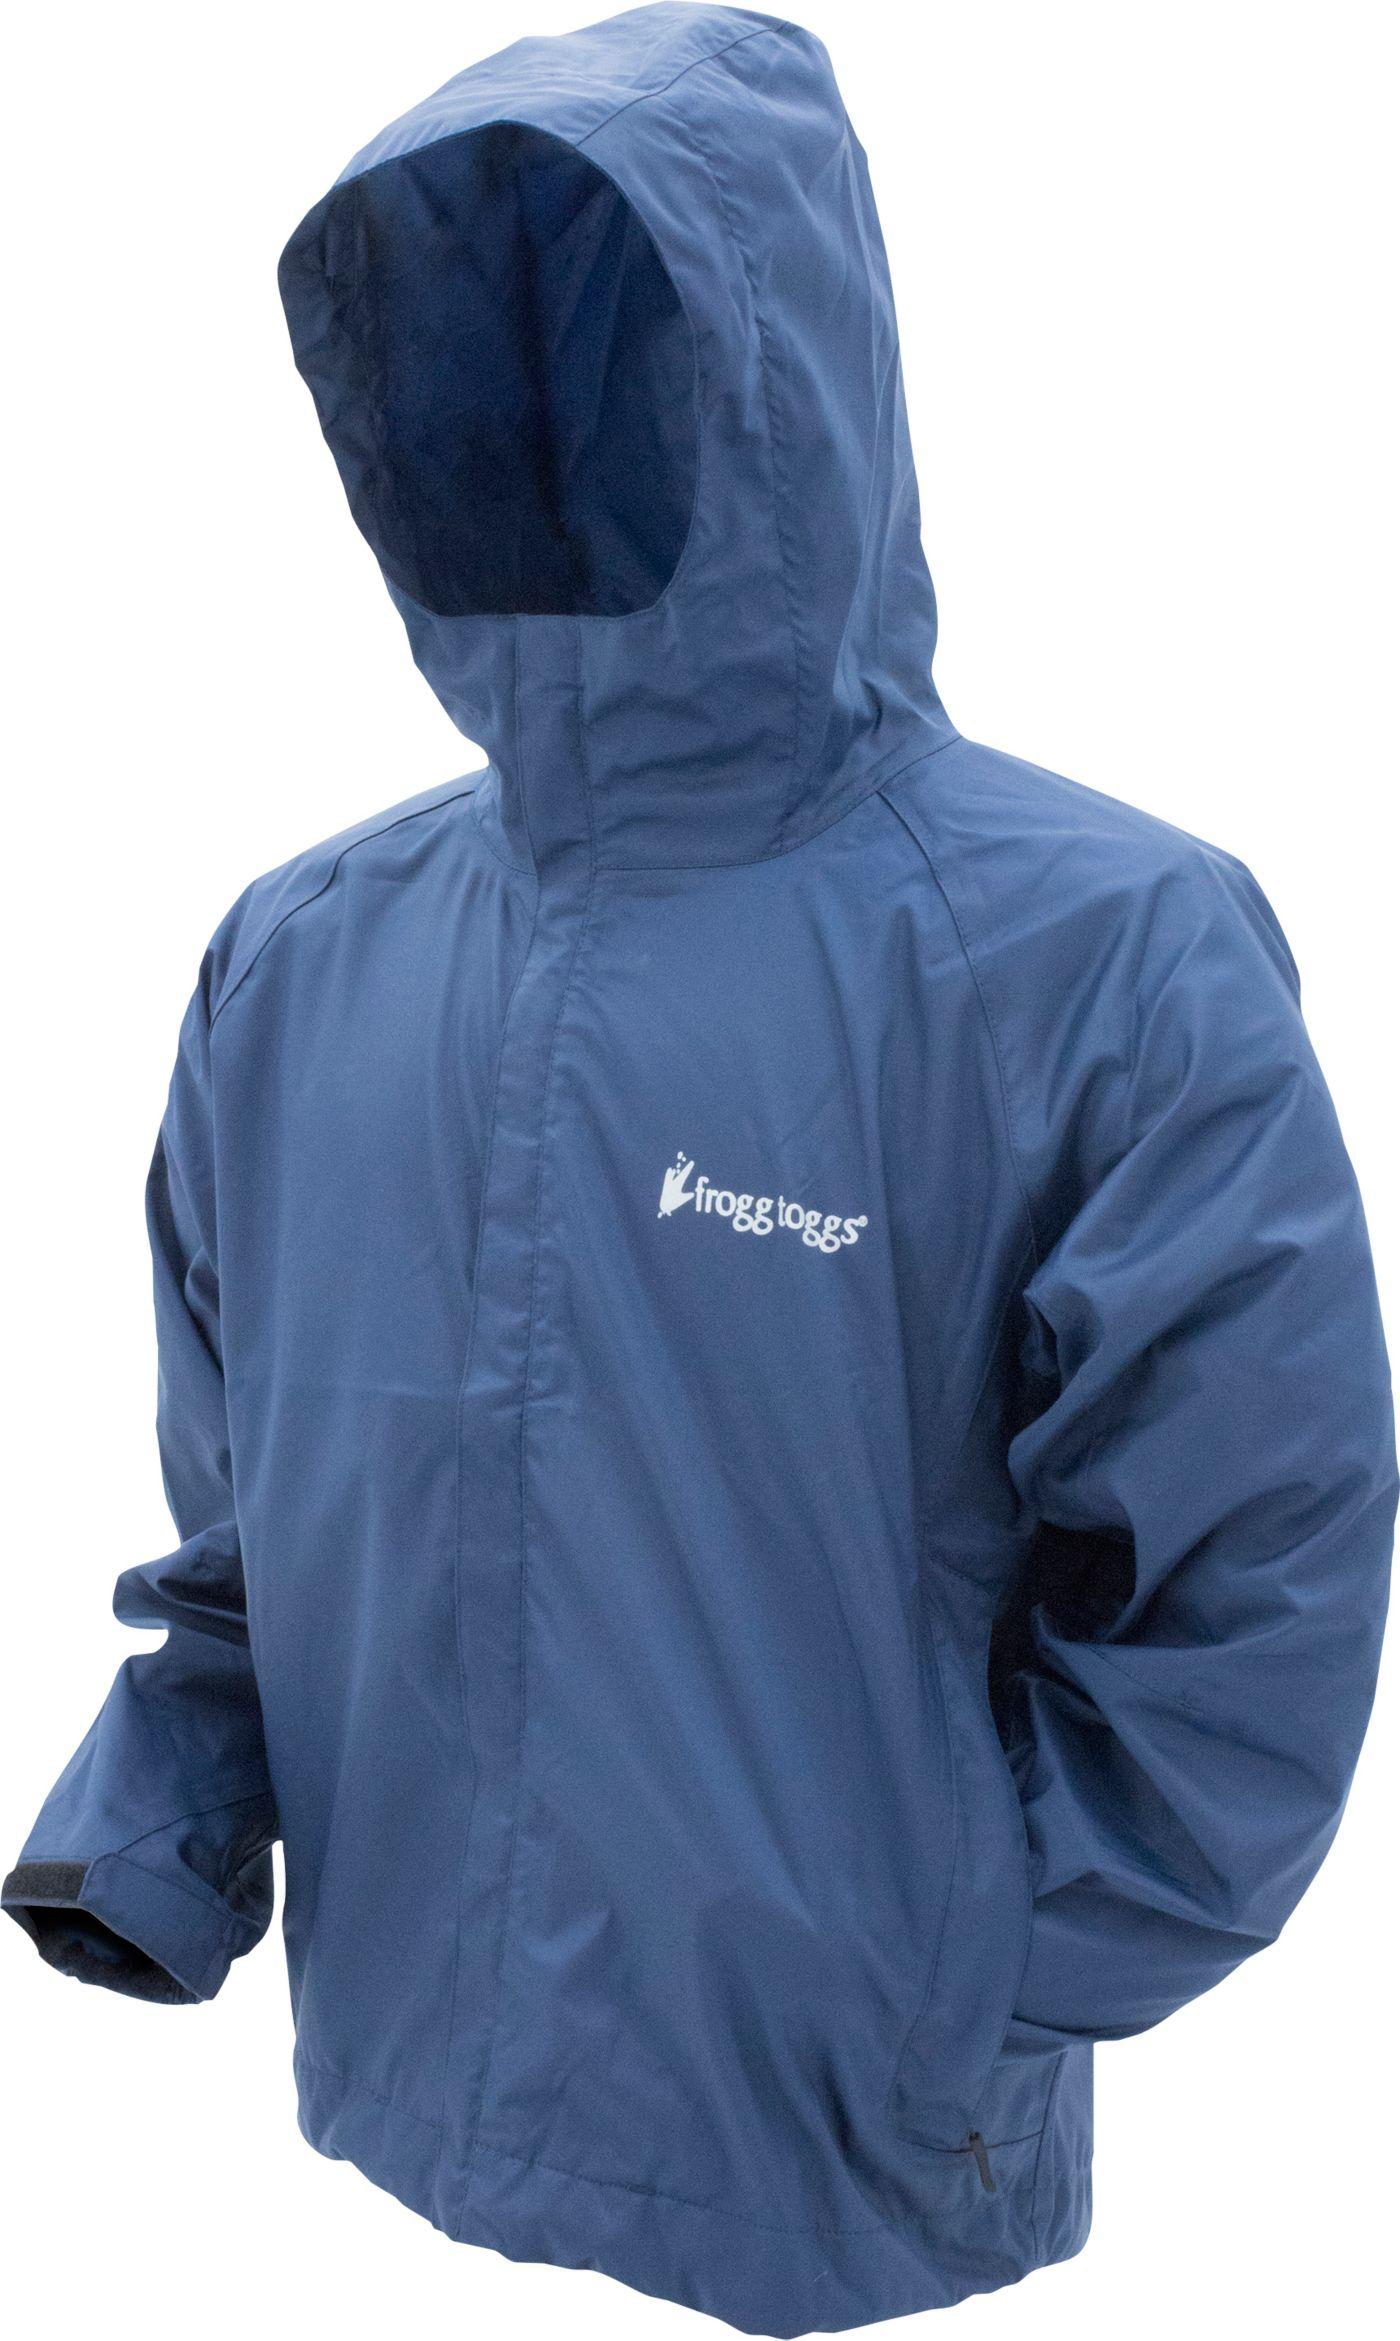 frogg toggs Men's StormWatch Jacket